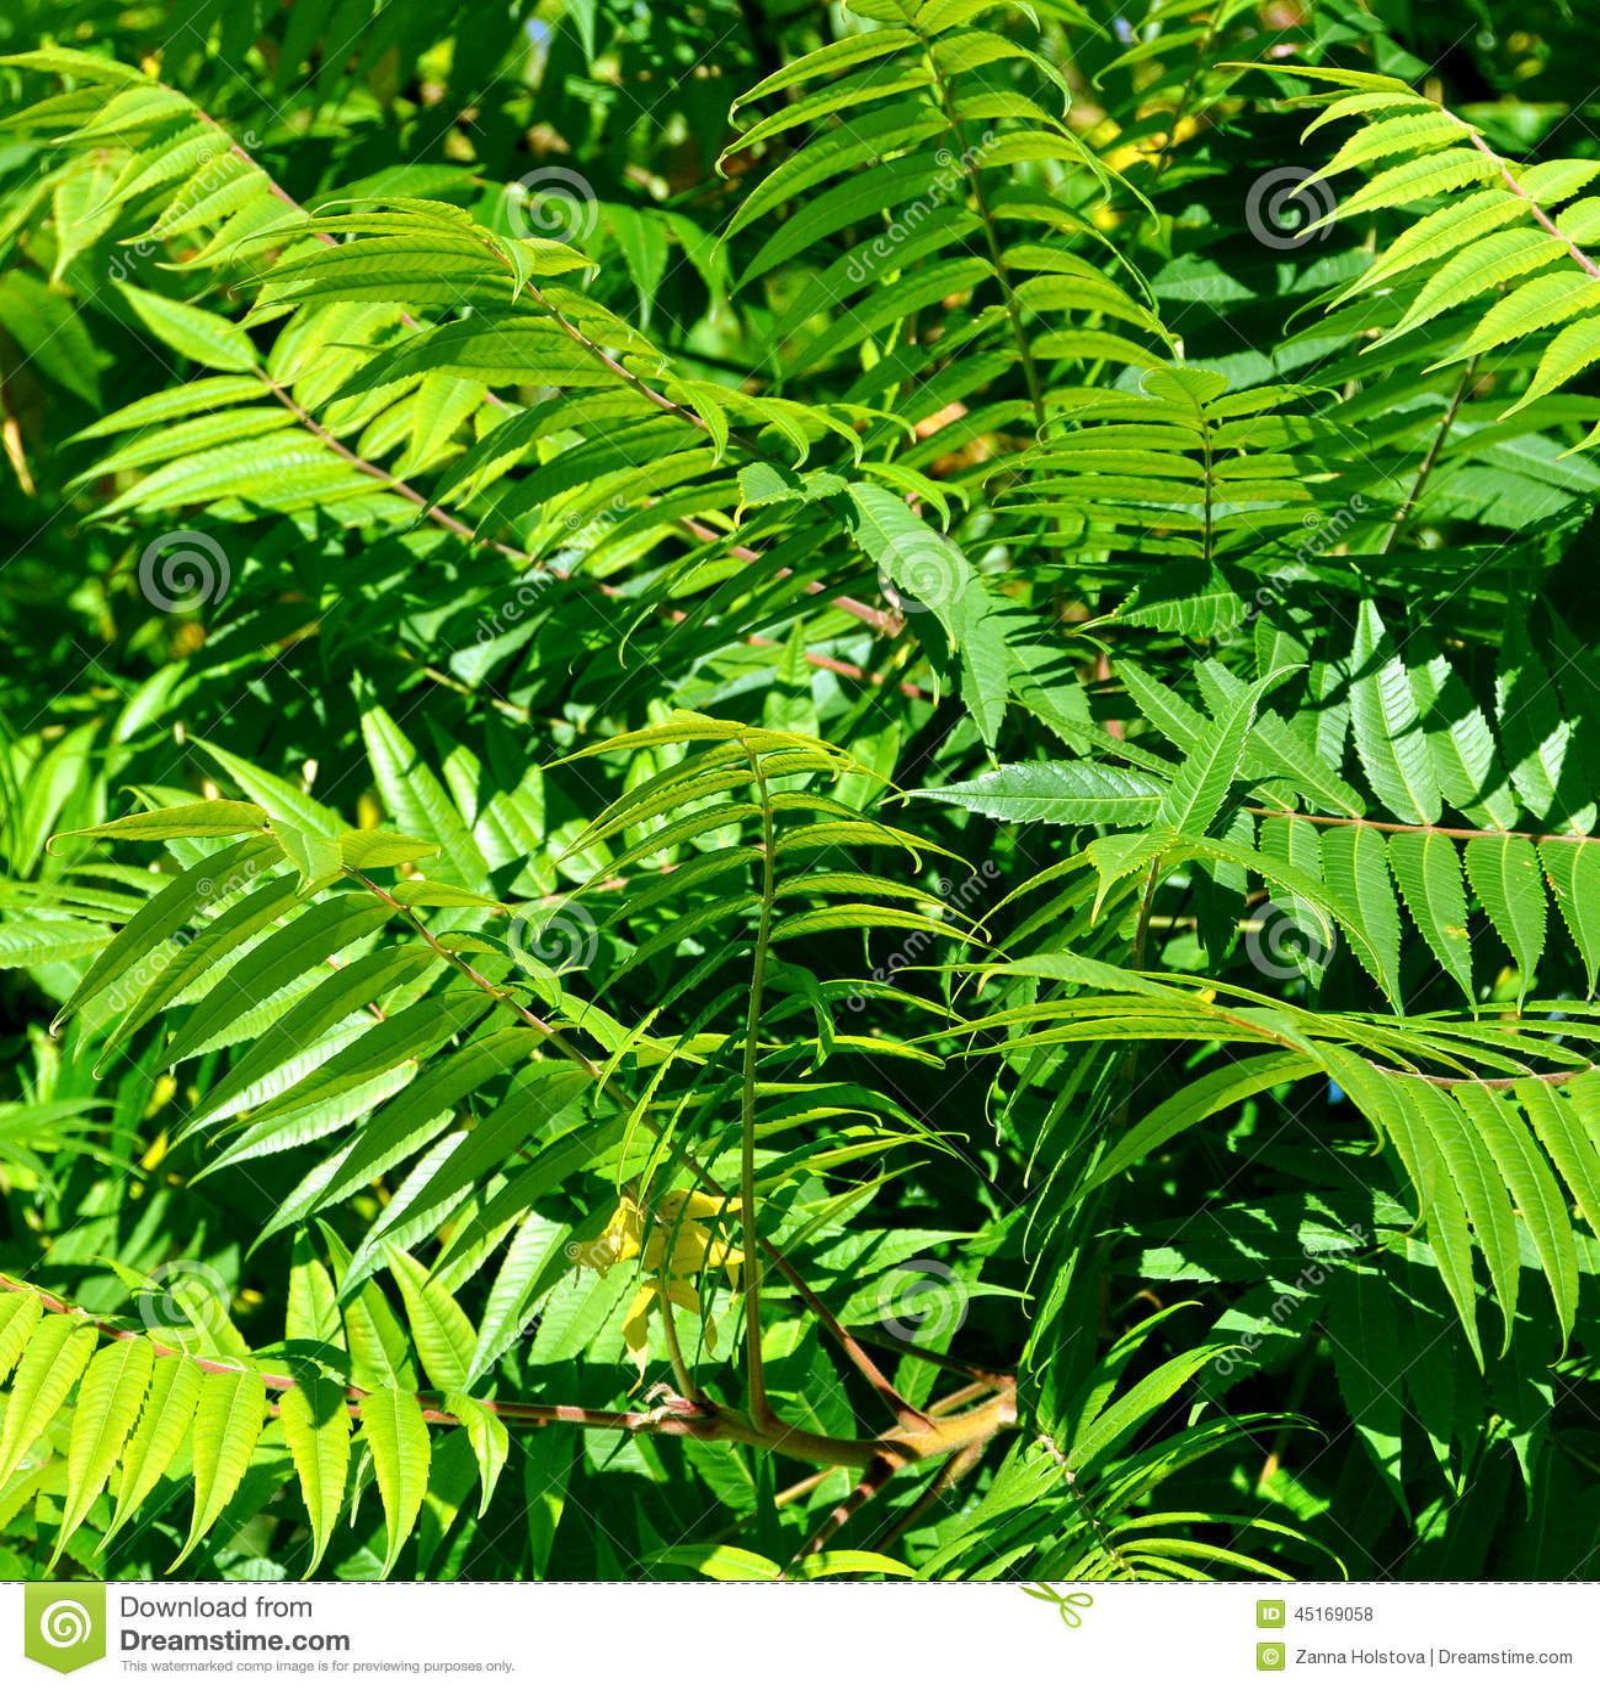 grand arbre feuilles caduques d 39 aylantus photo stock image du chinois lame 45169058. Black Bedroom Furniture Sets. Home Design Ideas